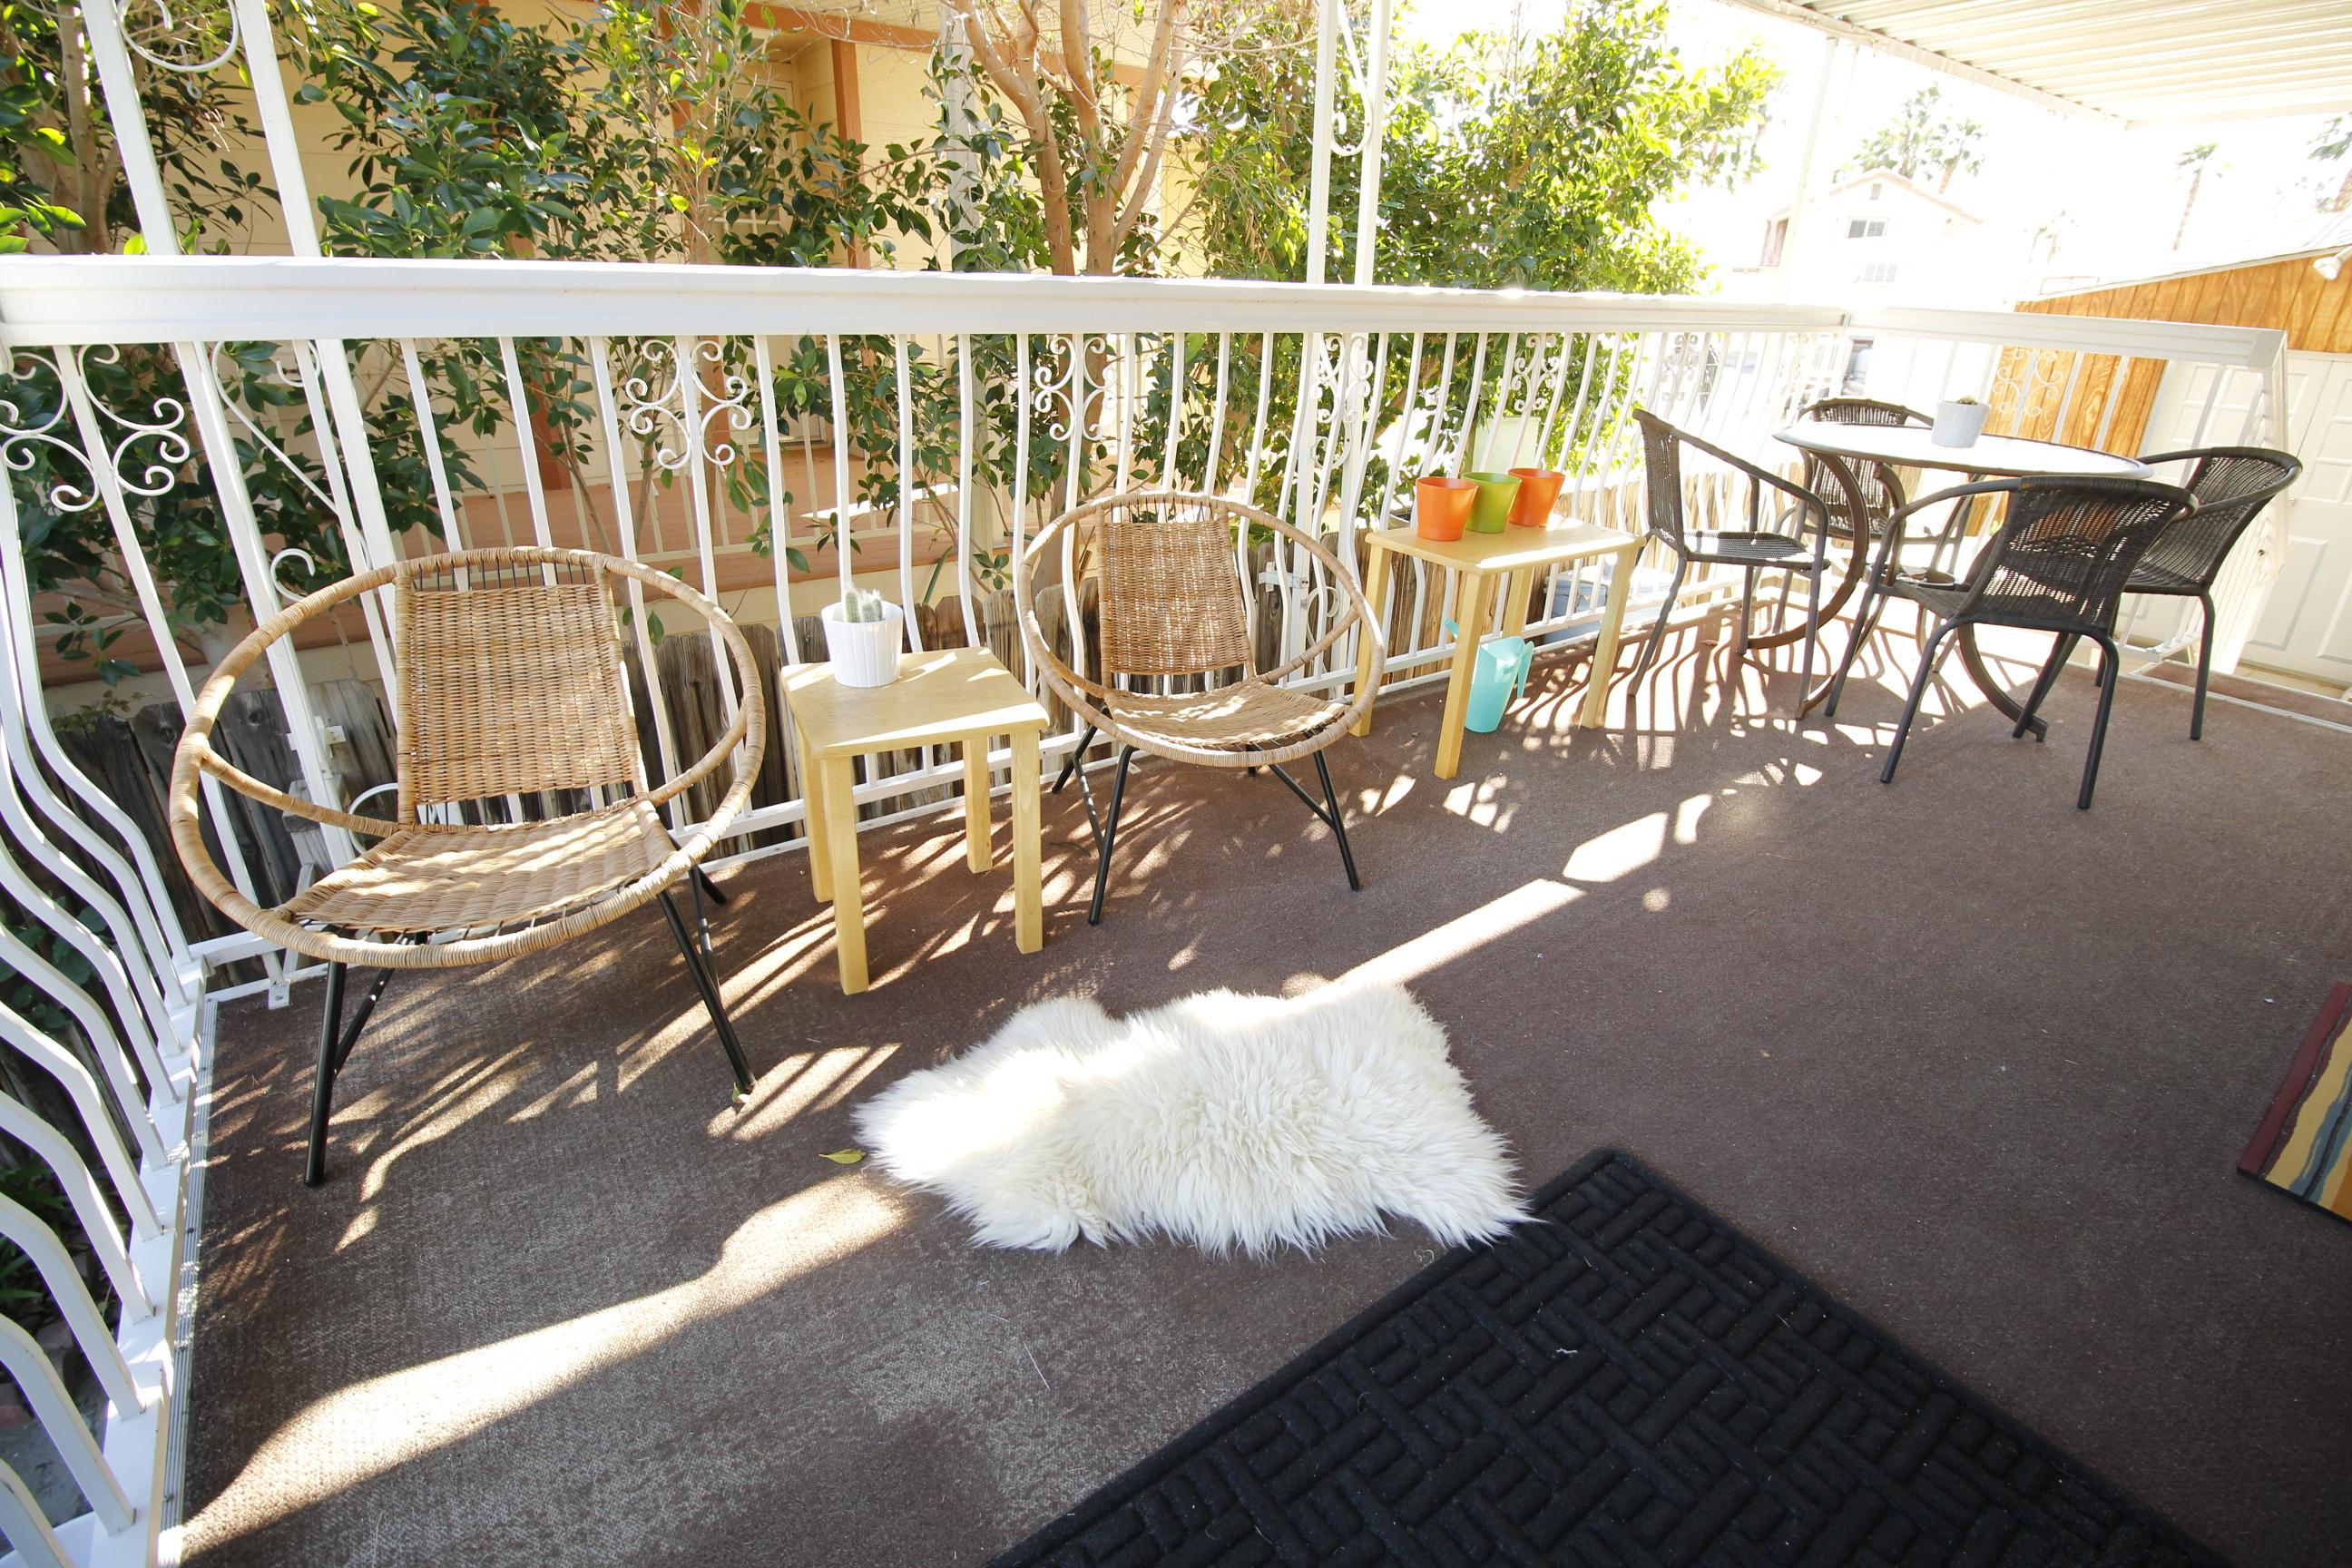 Retro Mod Pod vacation rental